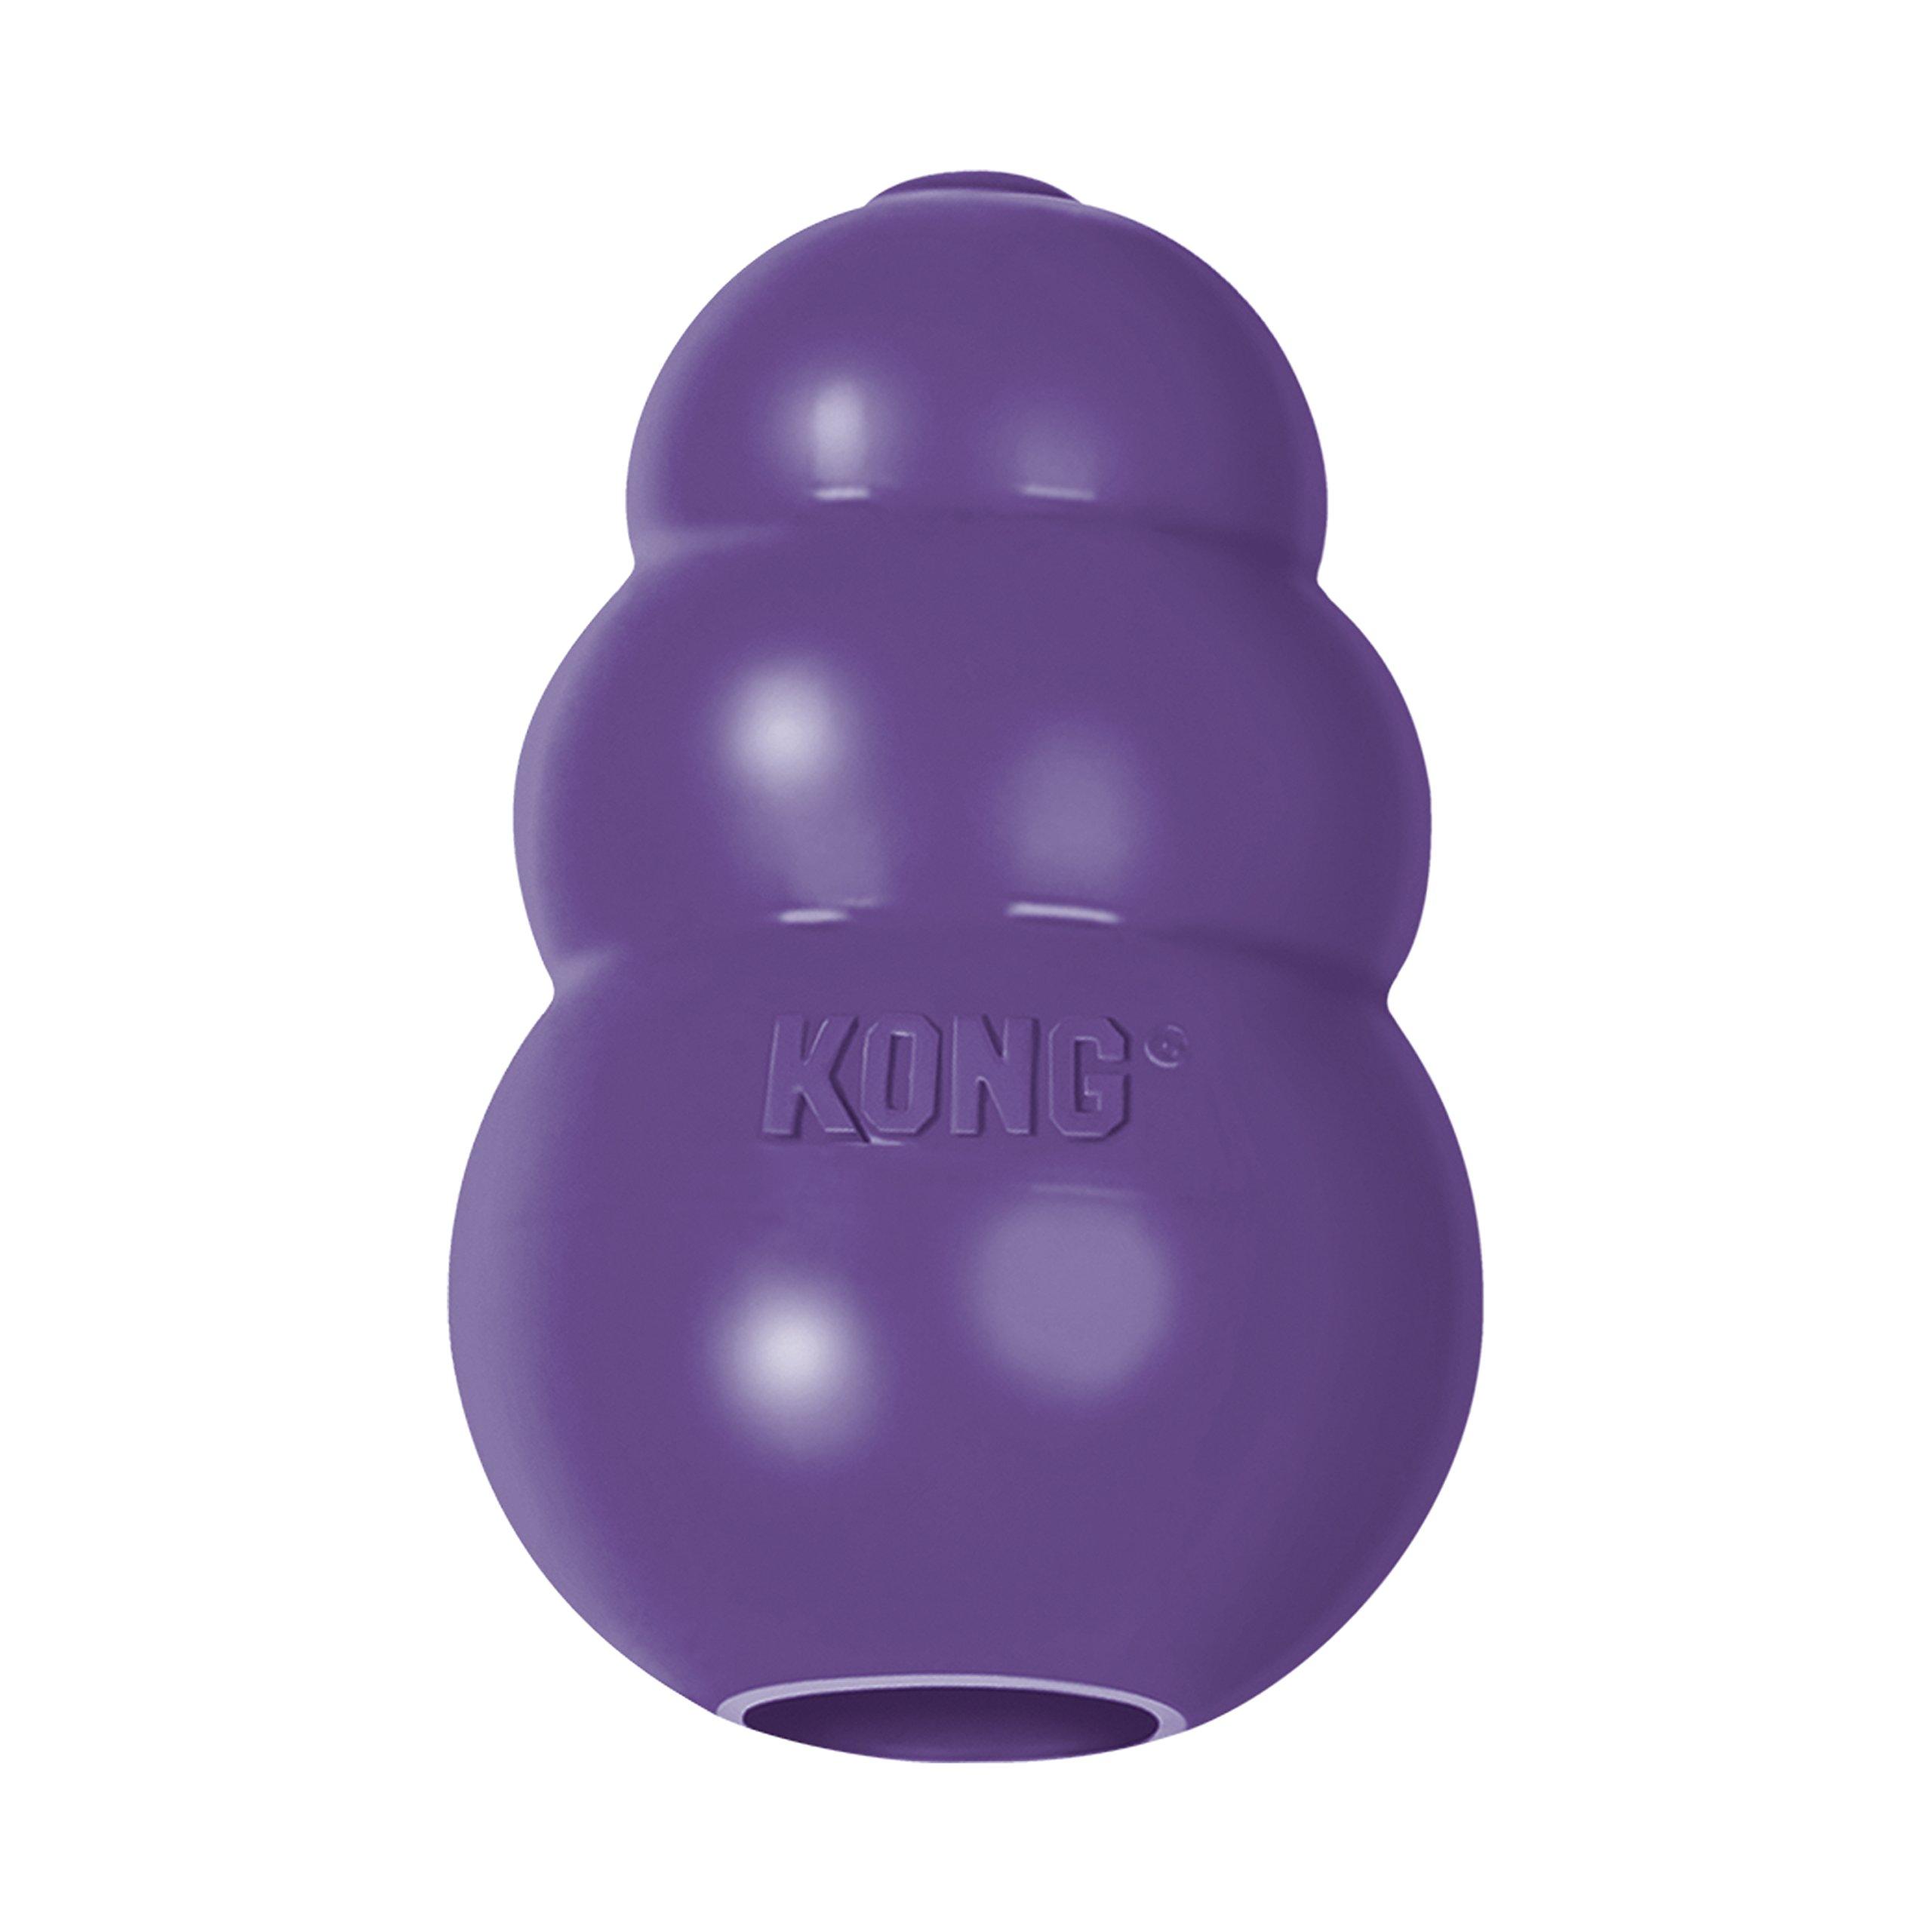 KONG Senior KONG Dog Toy Purple Small